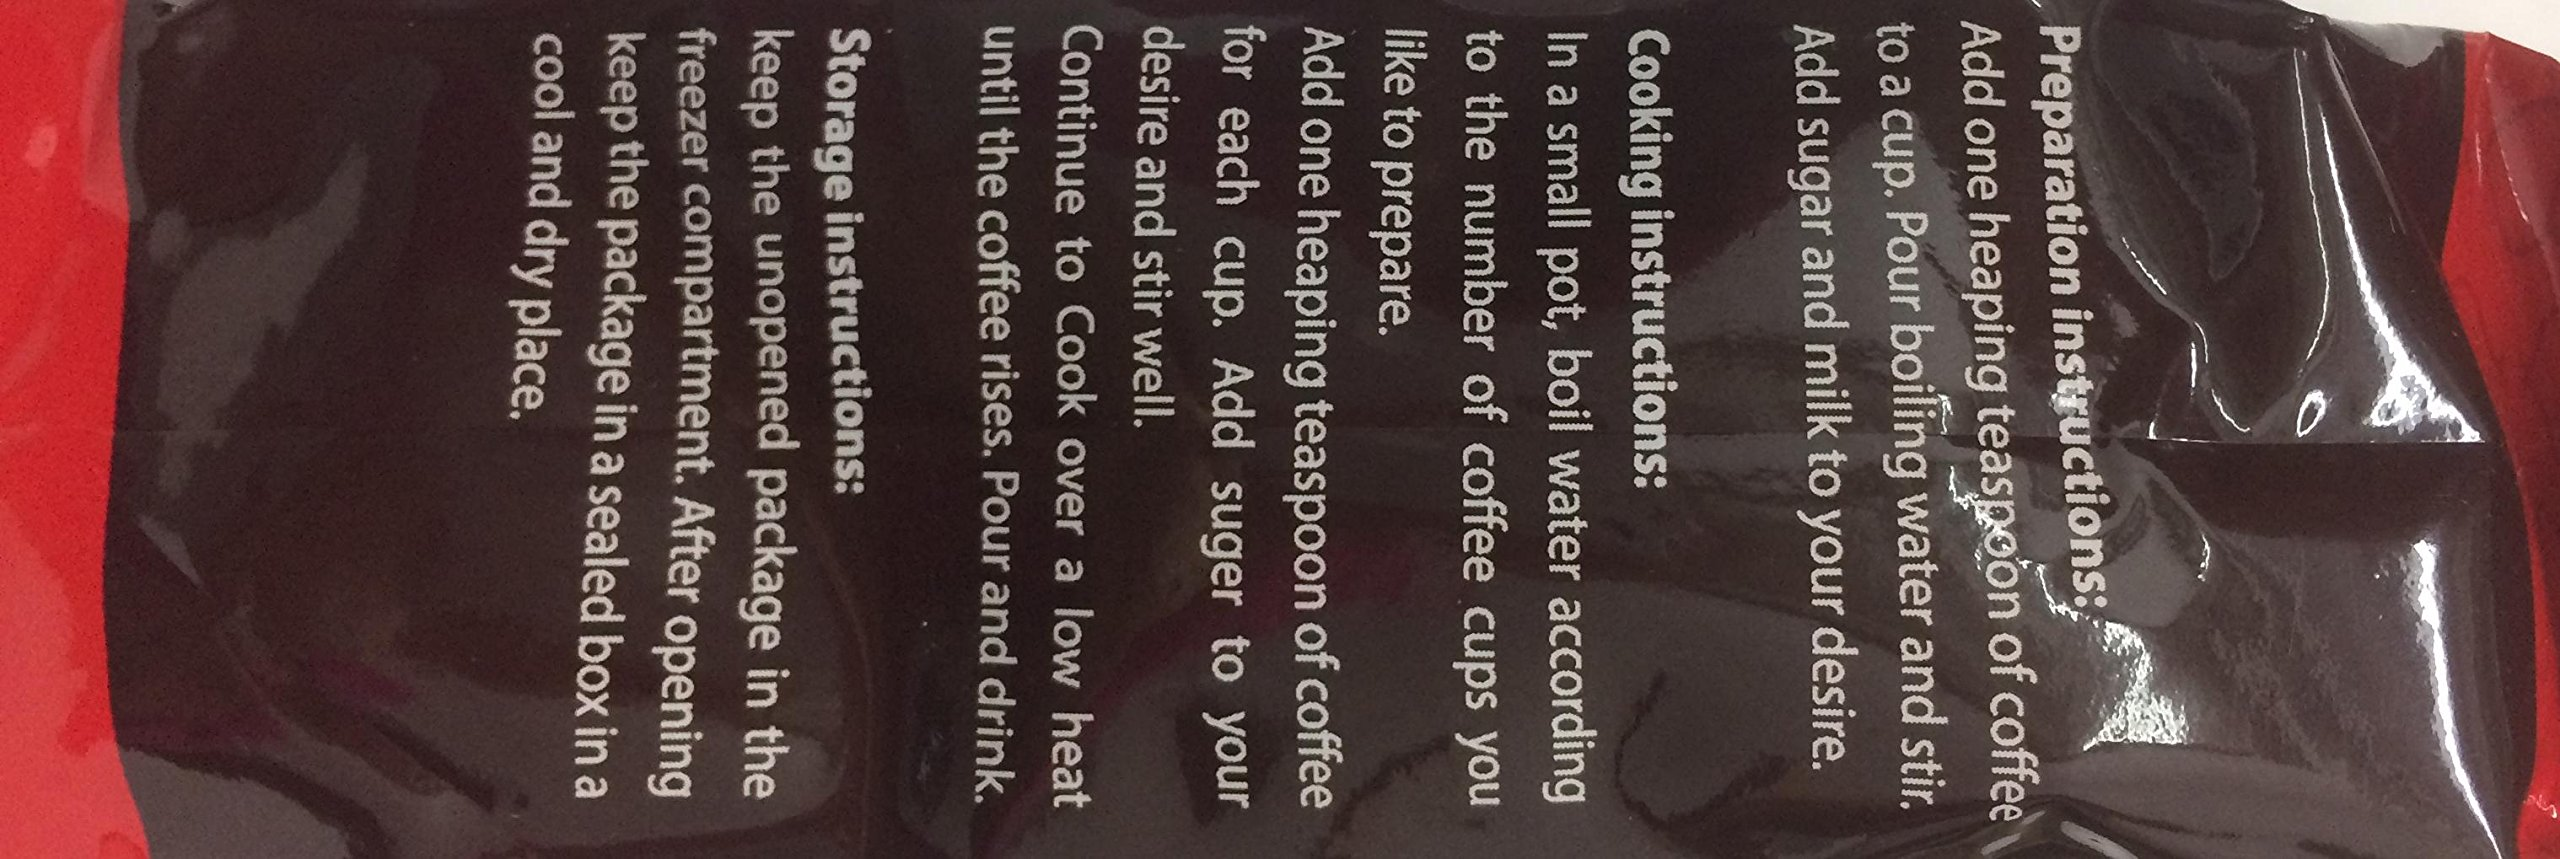 Elite, Coffee Aladin Turkish Vccpck, 7 OZ (Pack of 24)